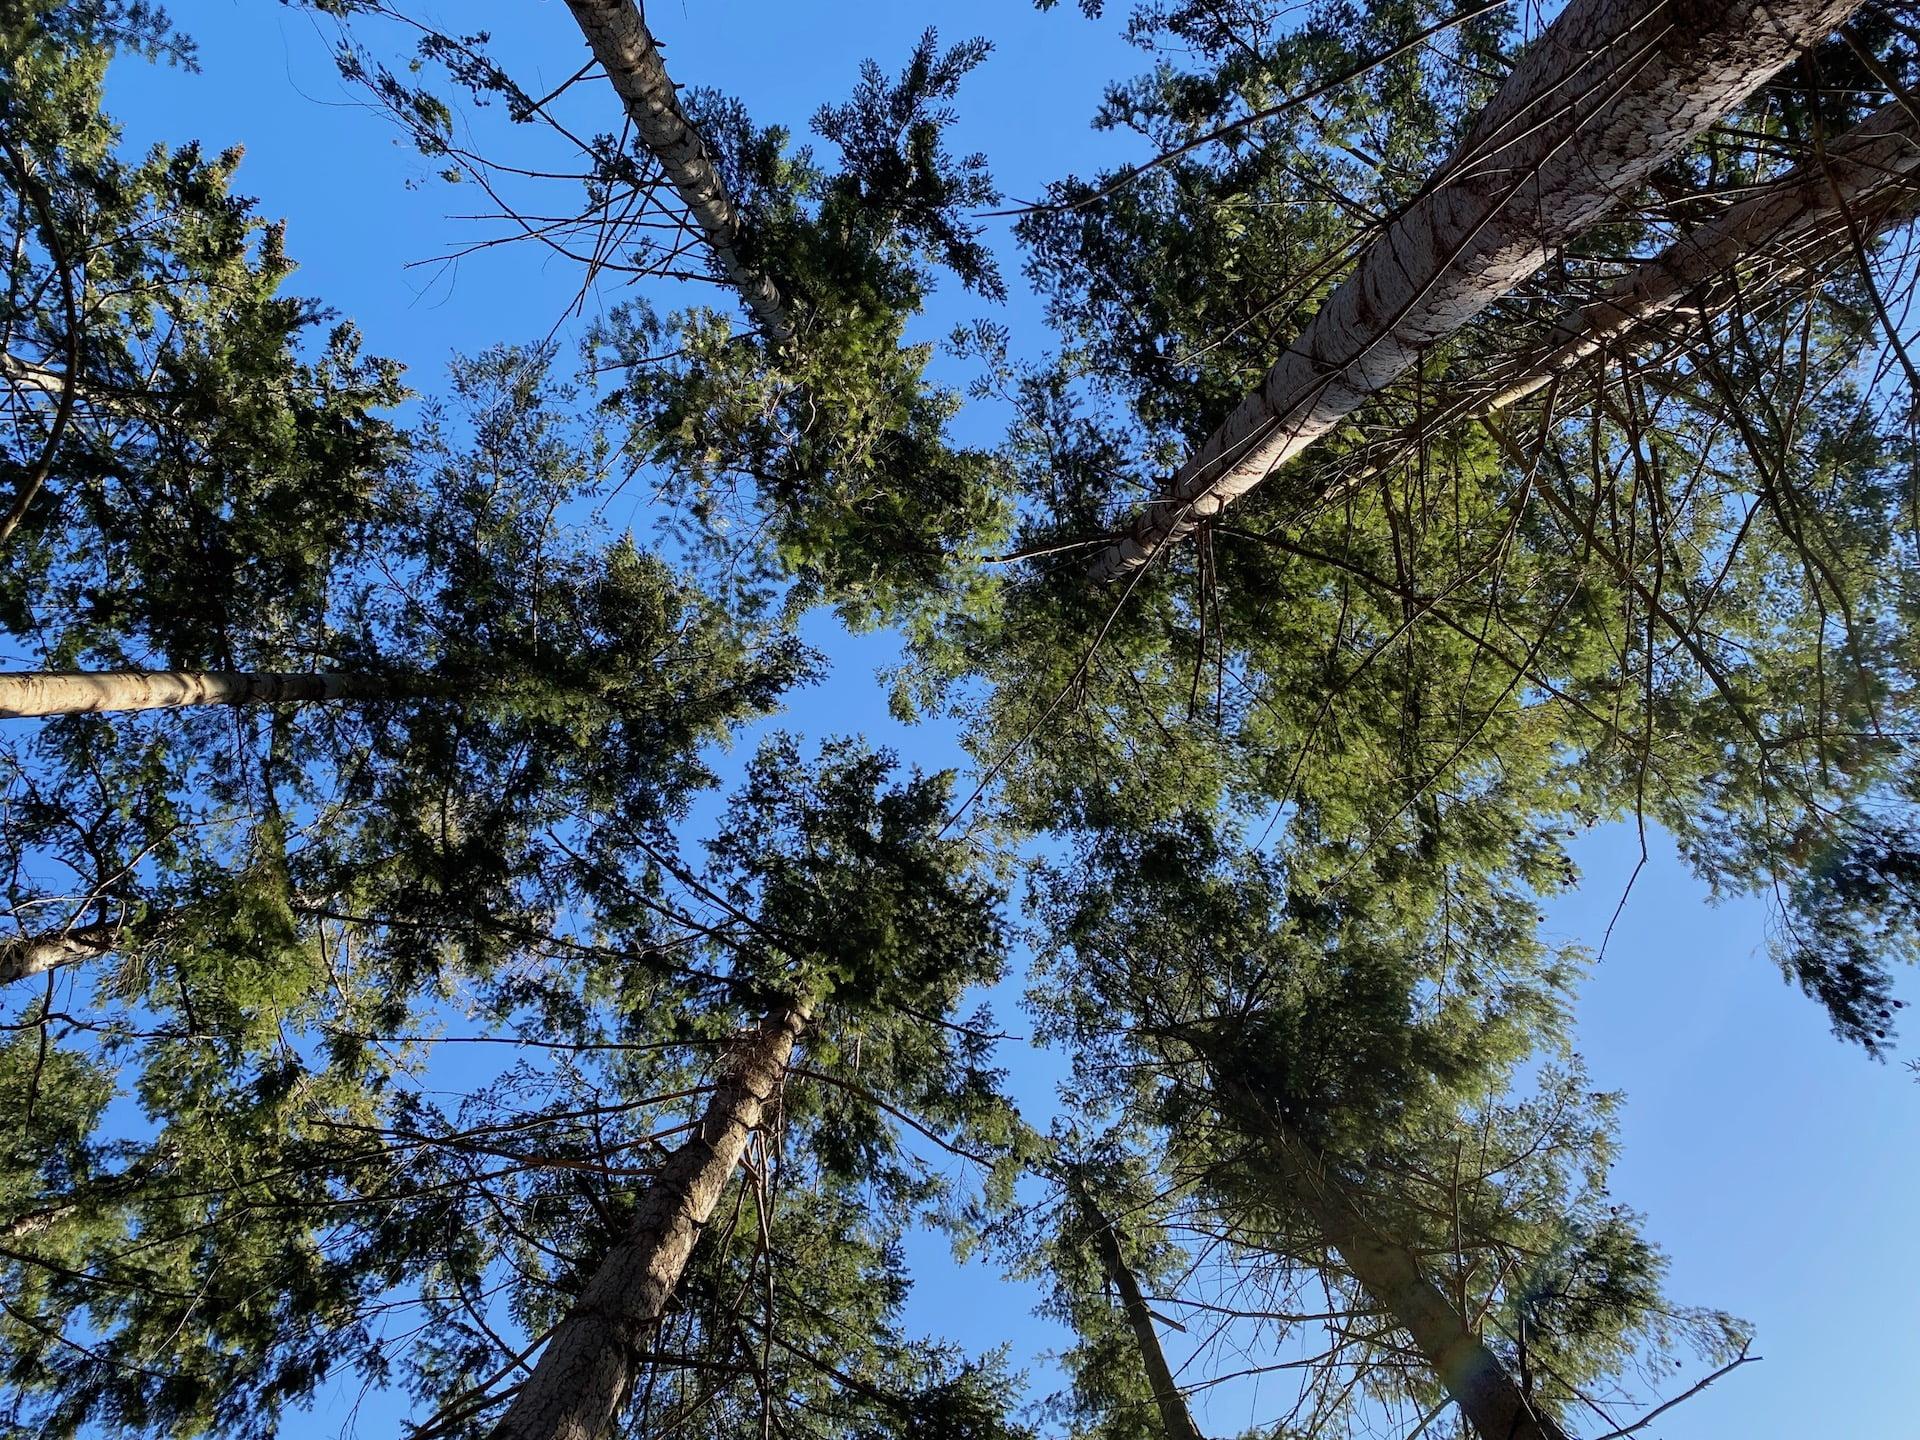 bognæs skov